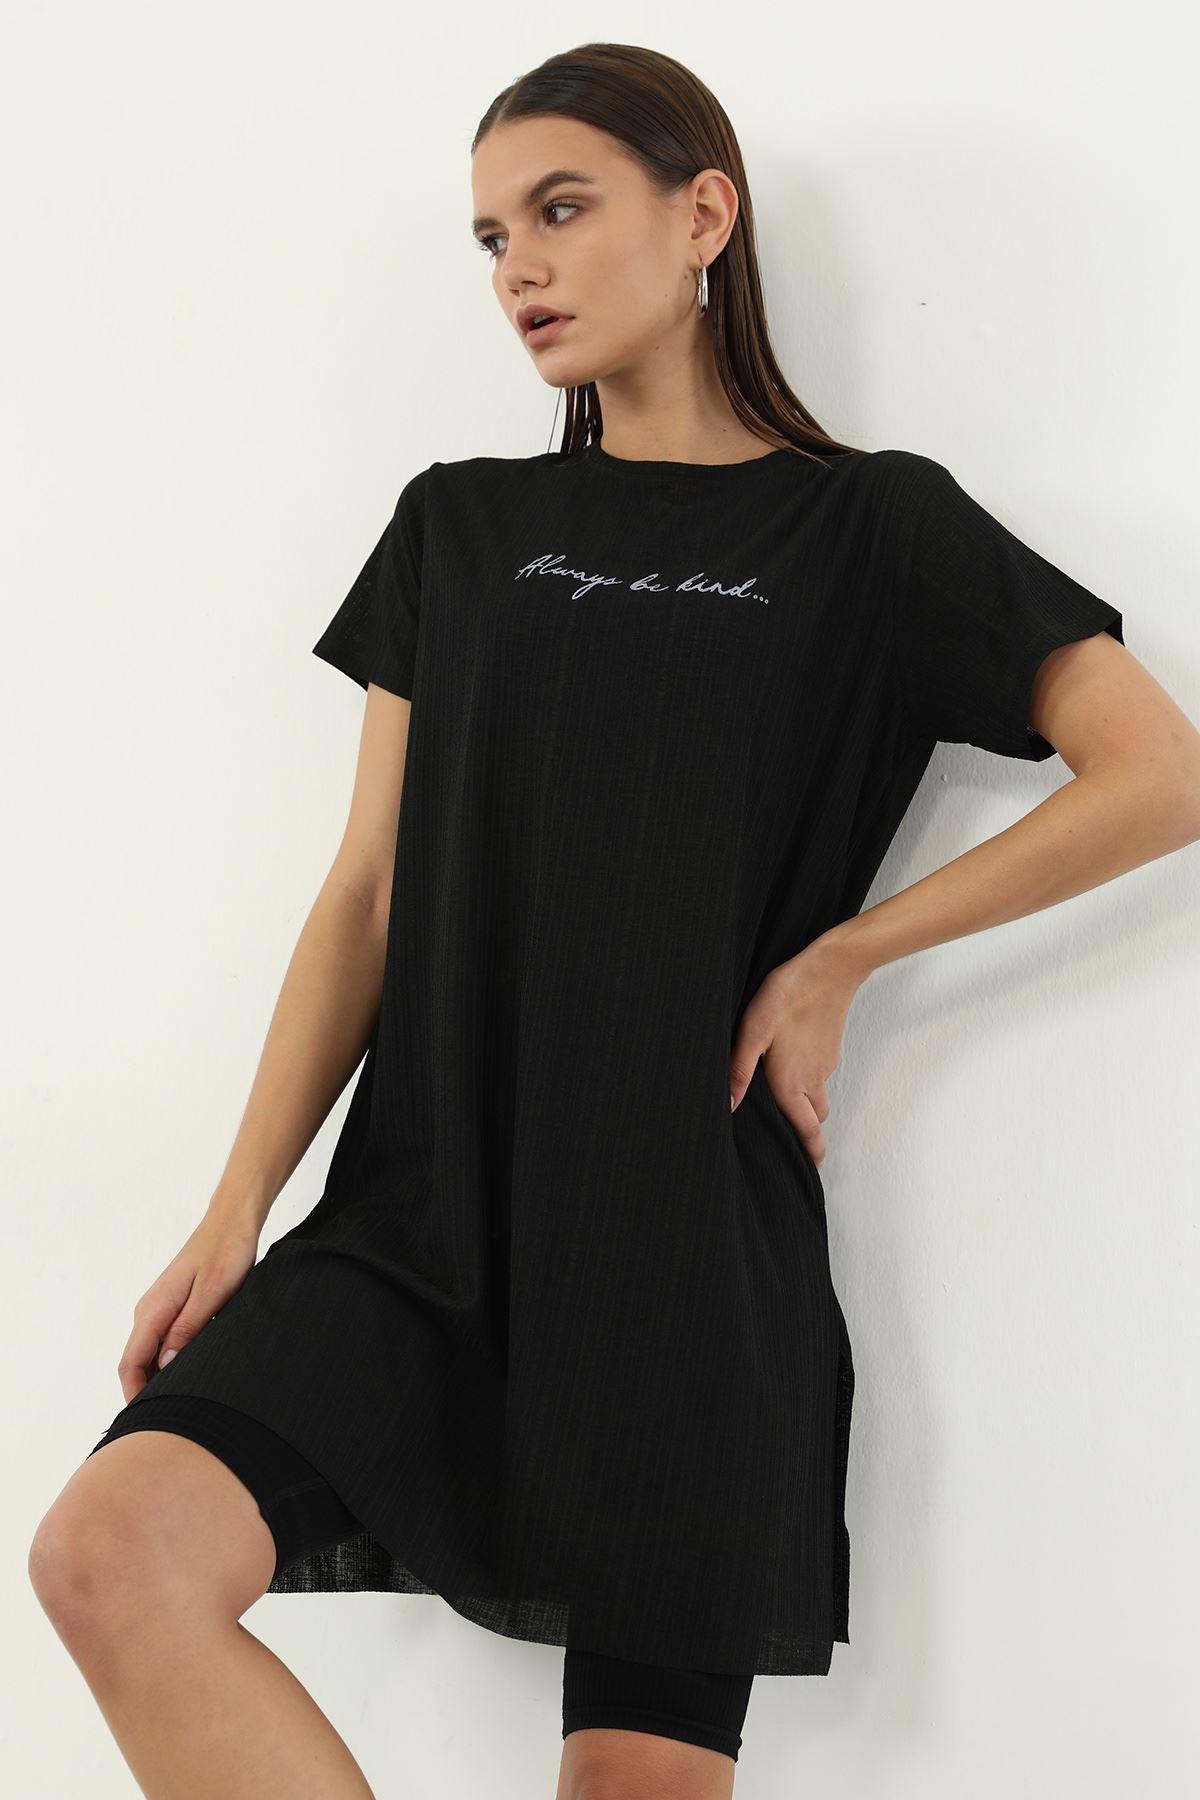 Alwarys Be Kind Baskılı T-shirt-Siyah